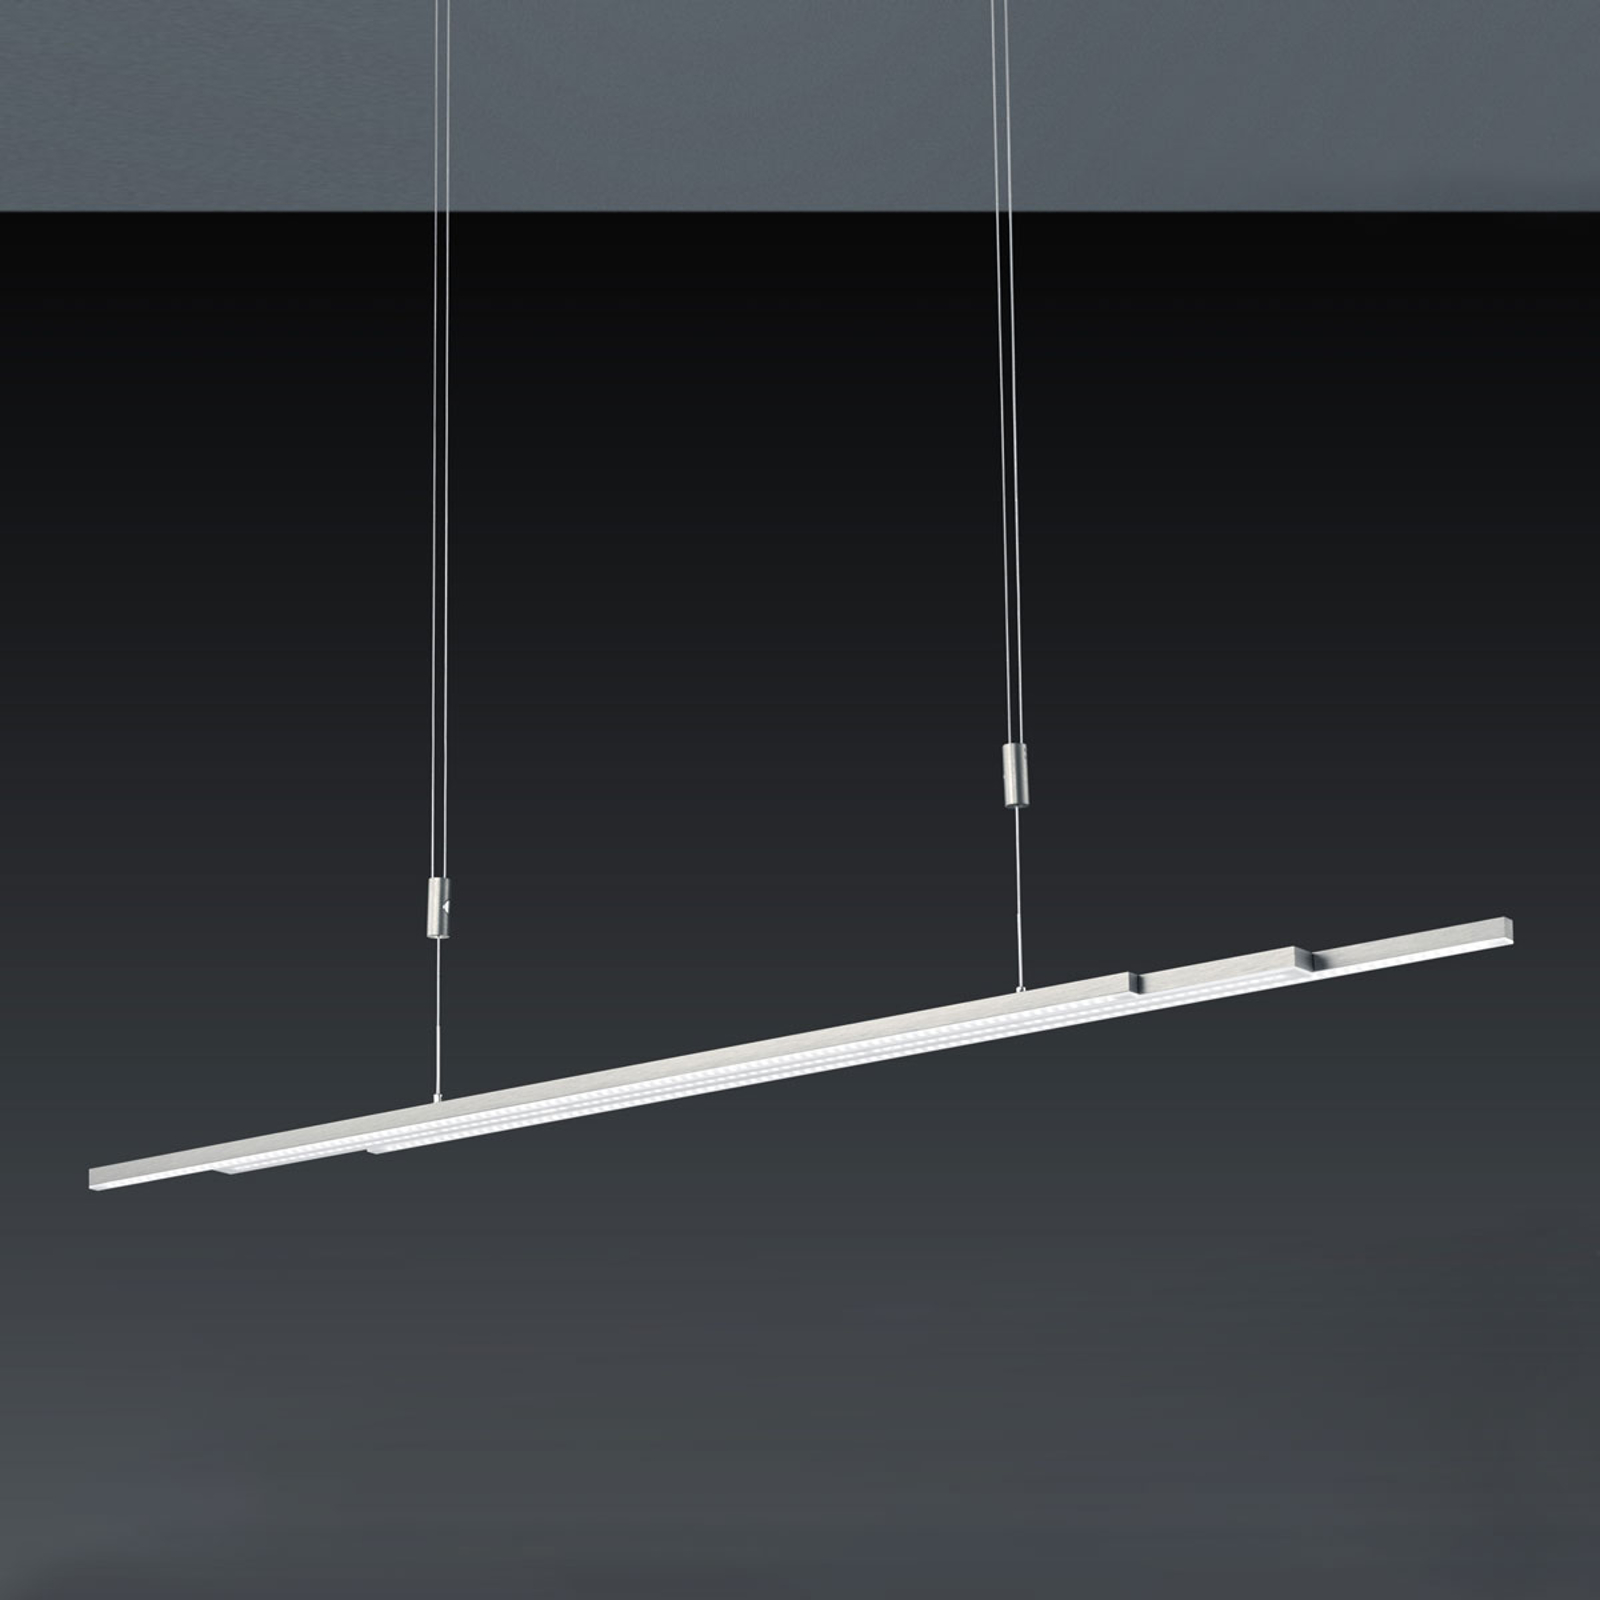 Acquista BANKAMP L-lightLINE lampada LED a sospensione